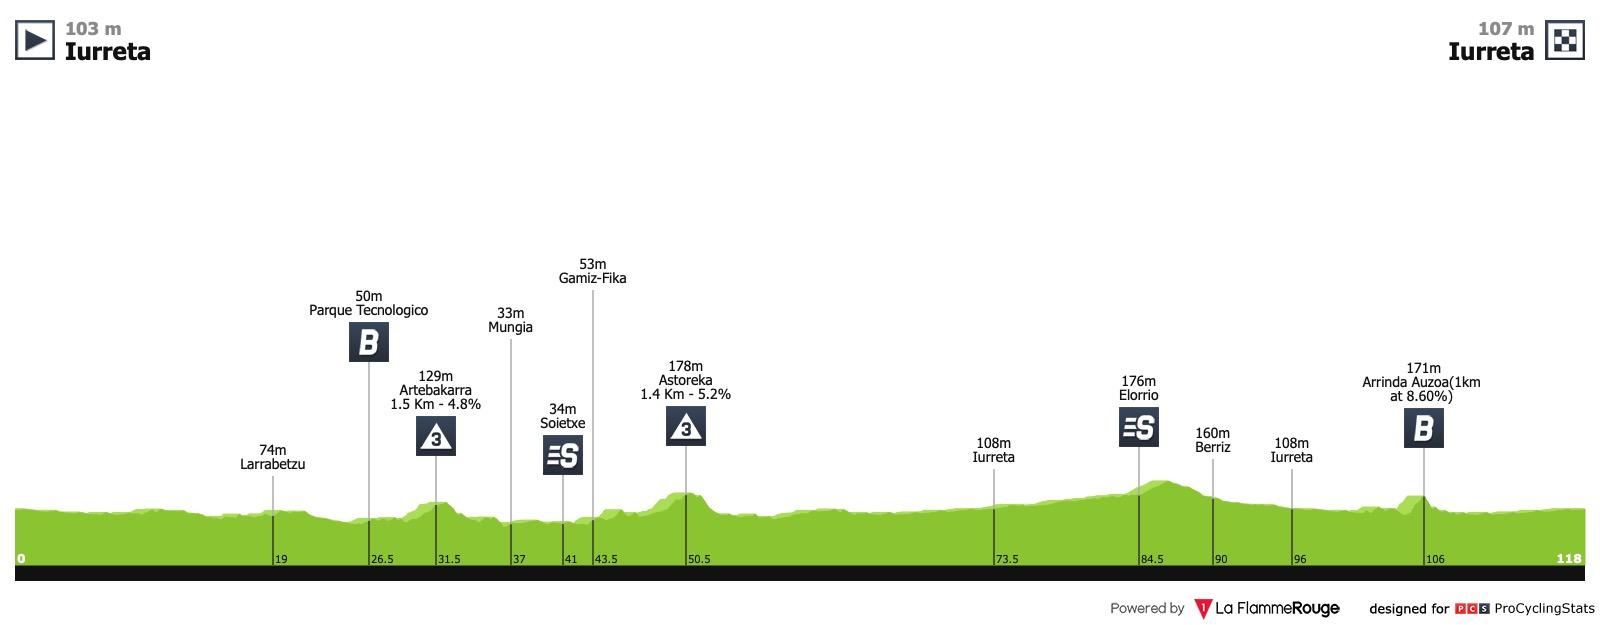 Le topic du cyclisme féminin - Page 47 Iurreta-emakumeen-bira-2019-stage-1-profile-55d97ff268